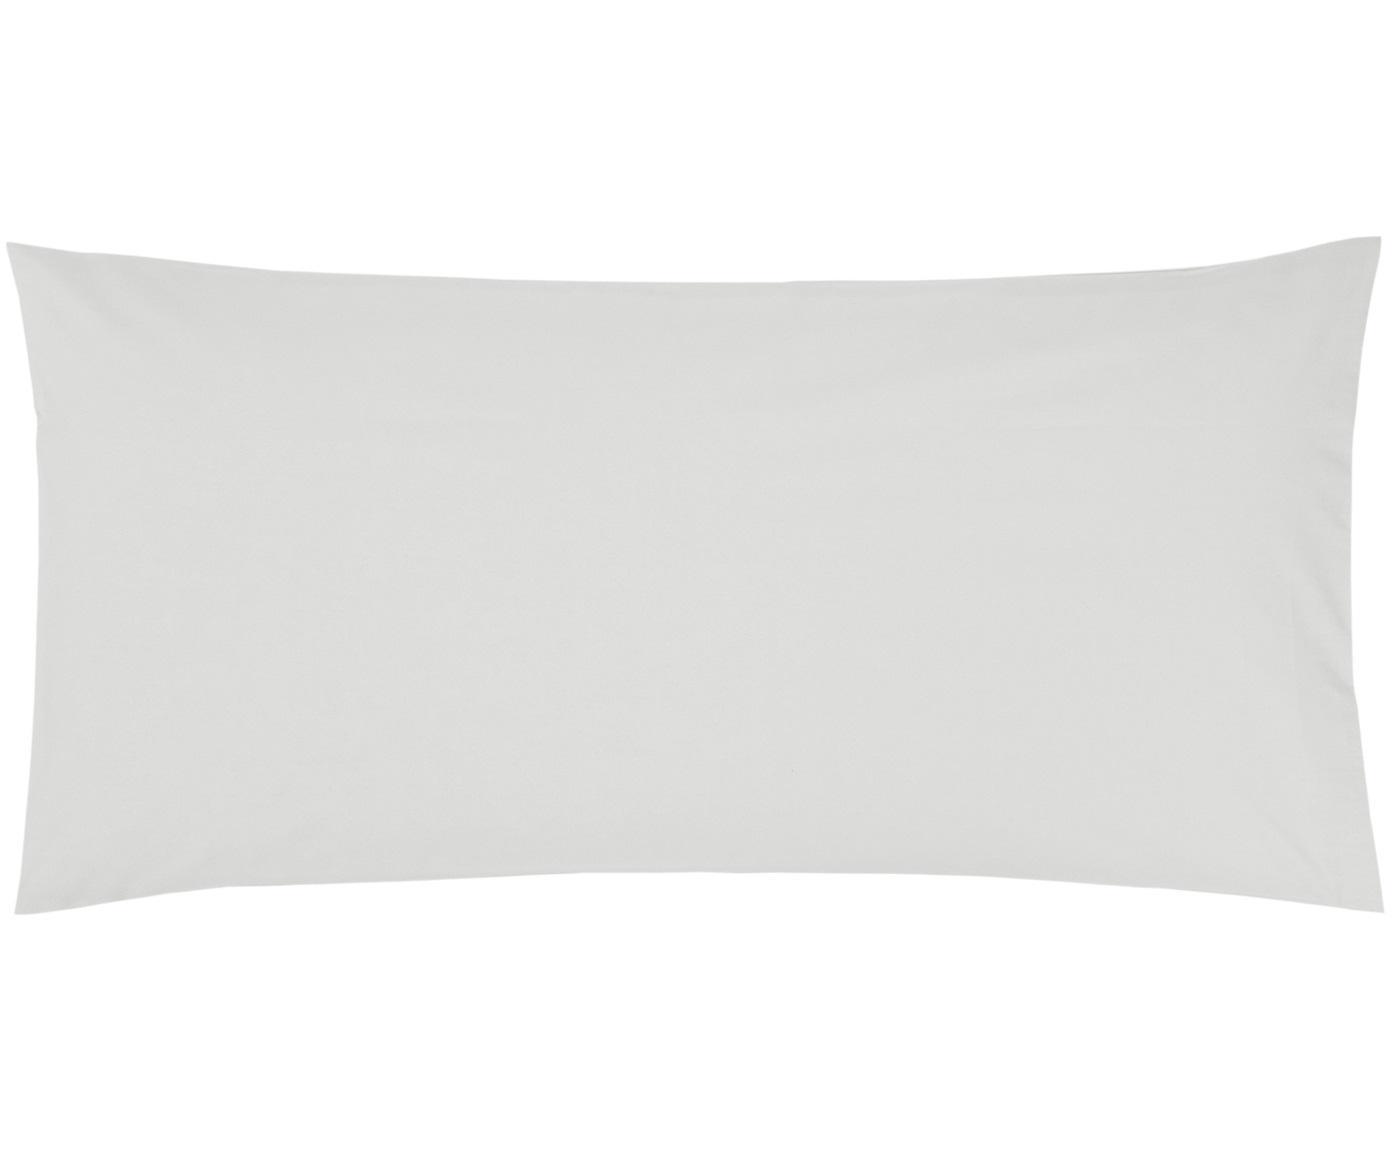 Baumwollperkal-Kissenbezüge Elsie in Hellgrau, 2 Stück, Webart: Perkal Fadendichte 200 TC, Hellgrau, 40 x 80 cm